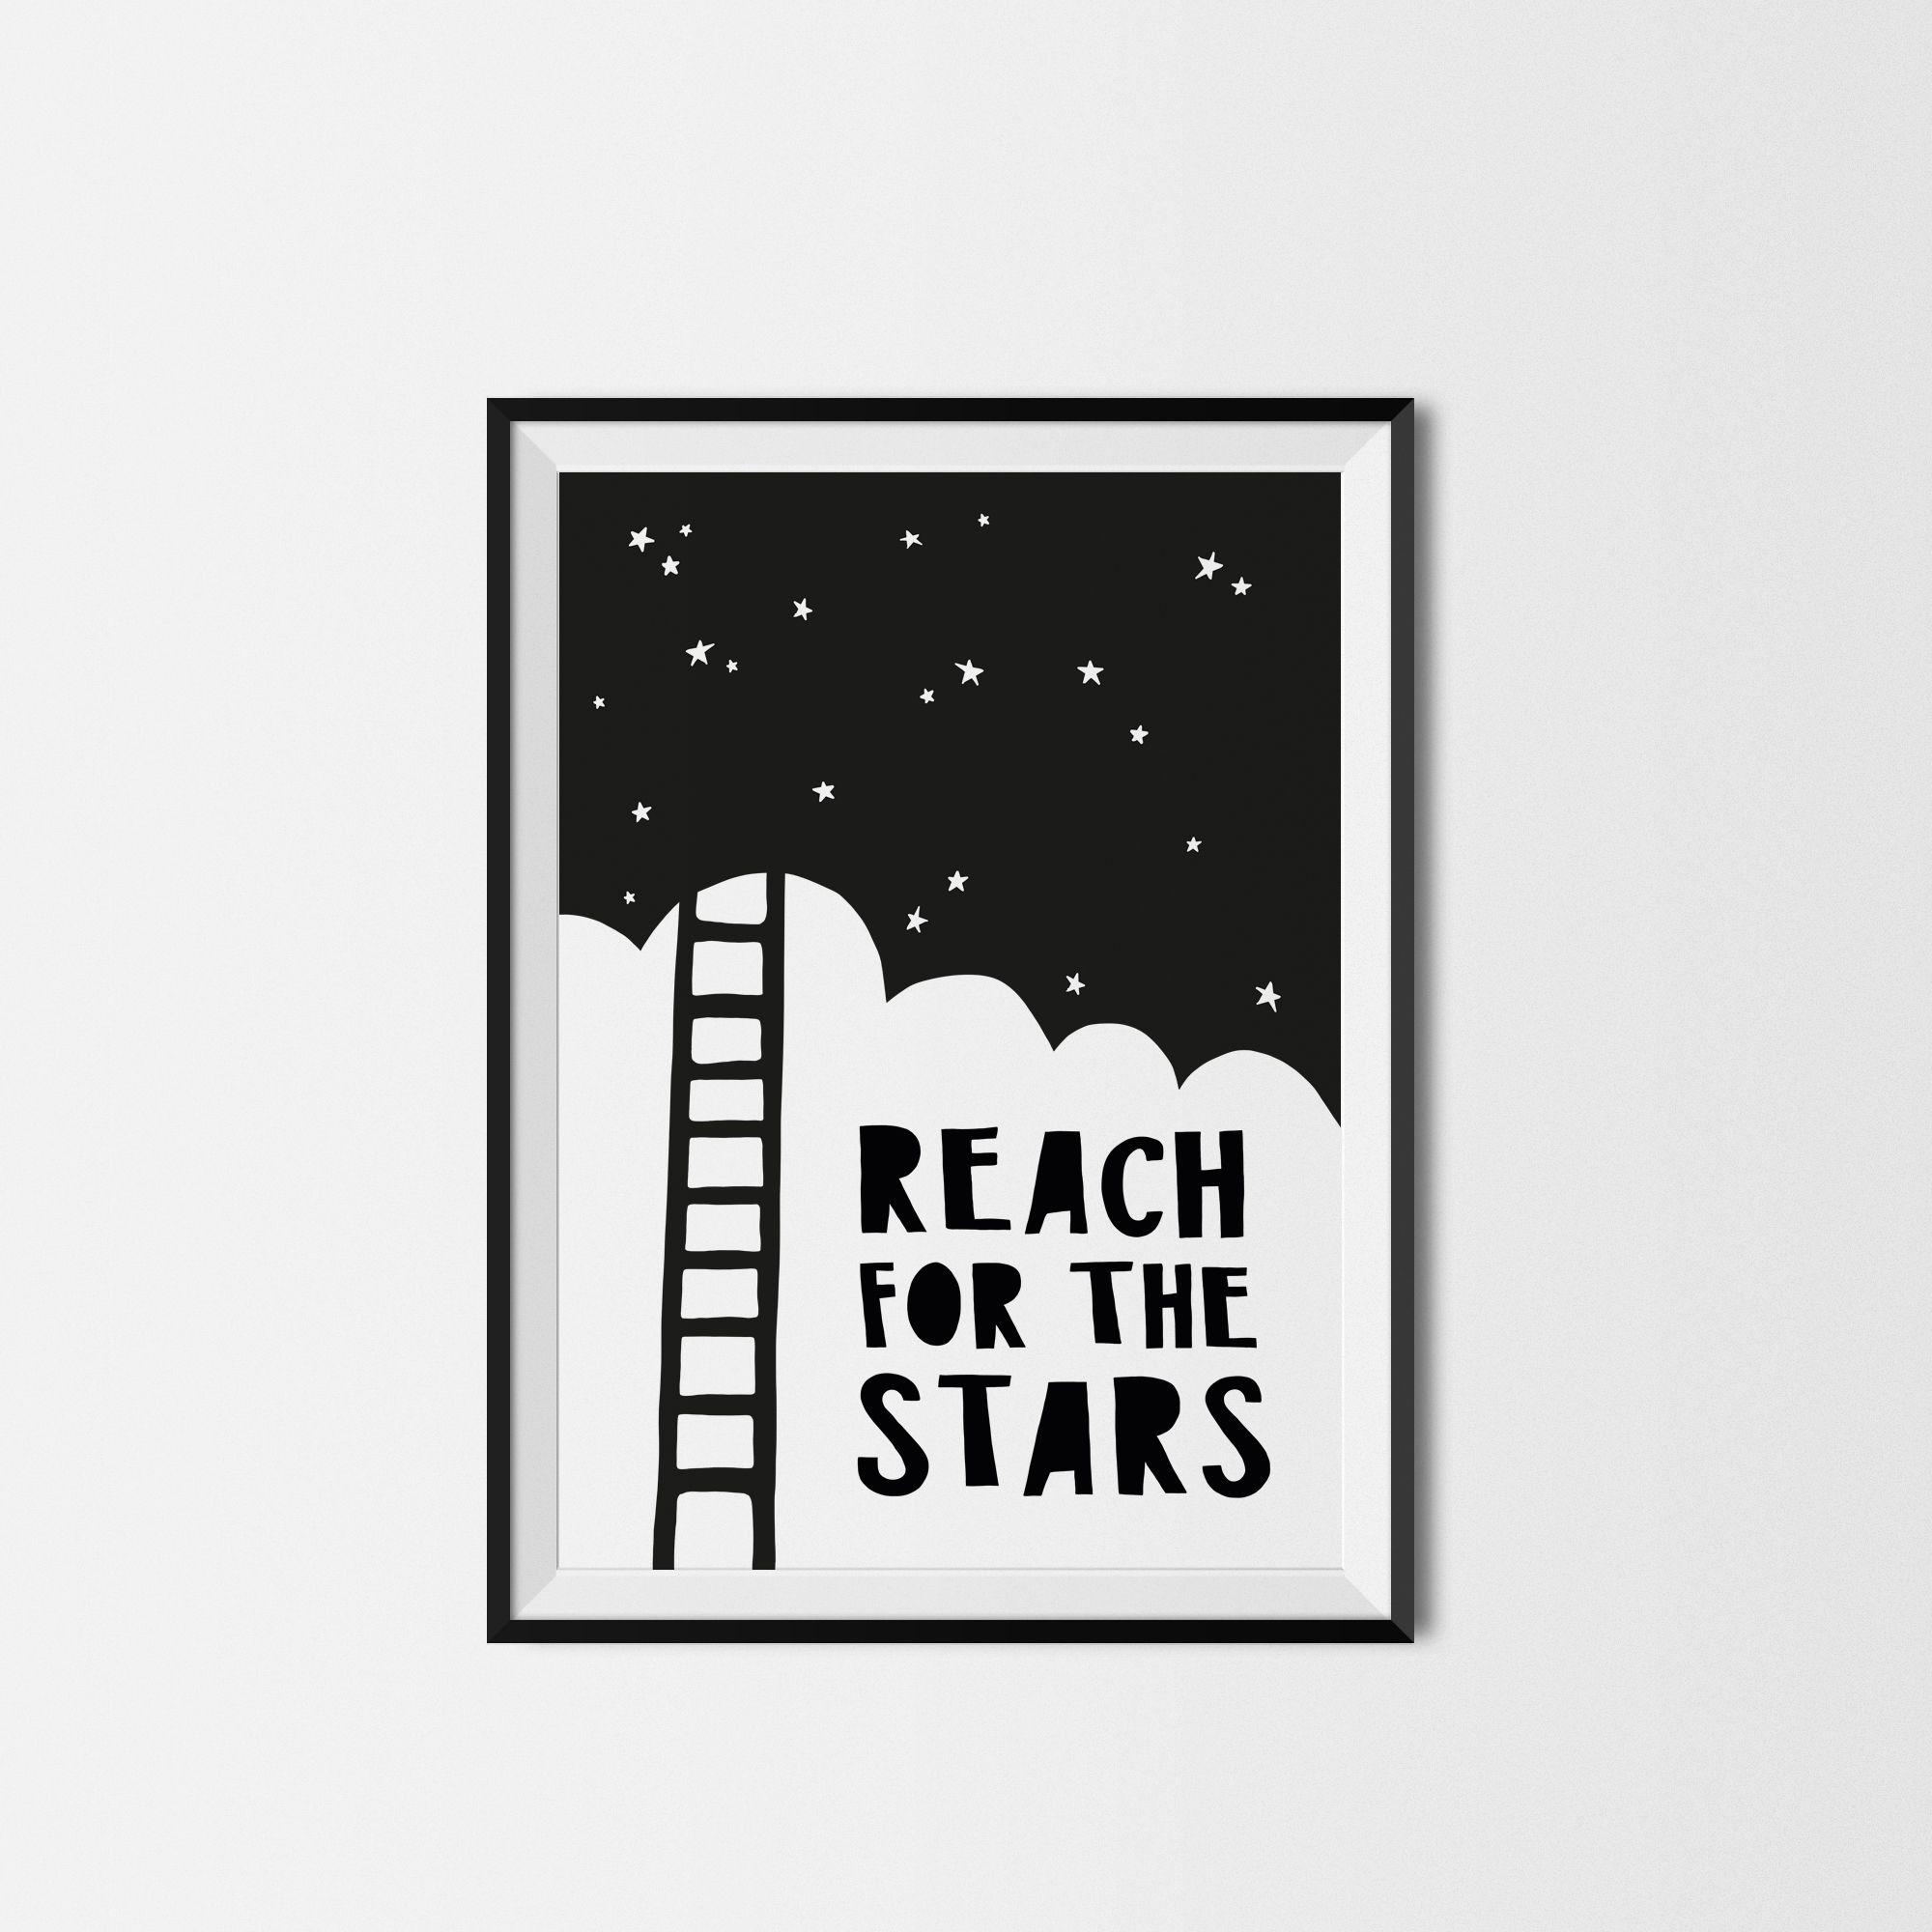 Reach For The Stars Printed Poster Kids Wall Art Decor Monochrome Print Black White Modern Typography Kids P Kids Prints Art Wall Kids Kids Art Wall Decor